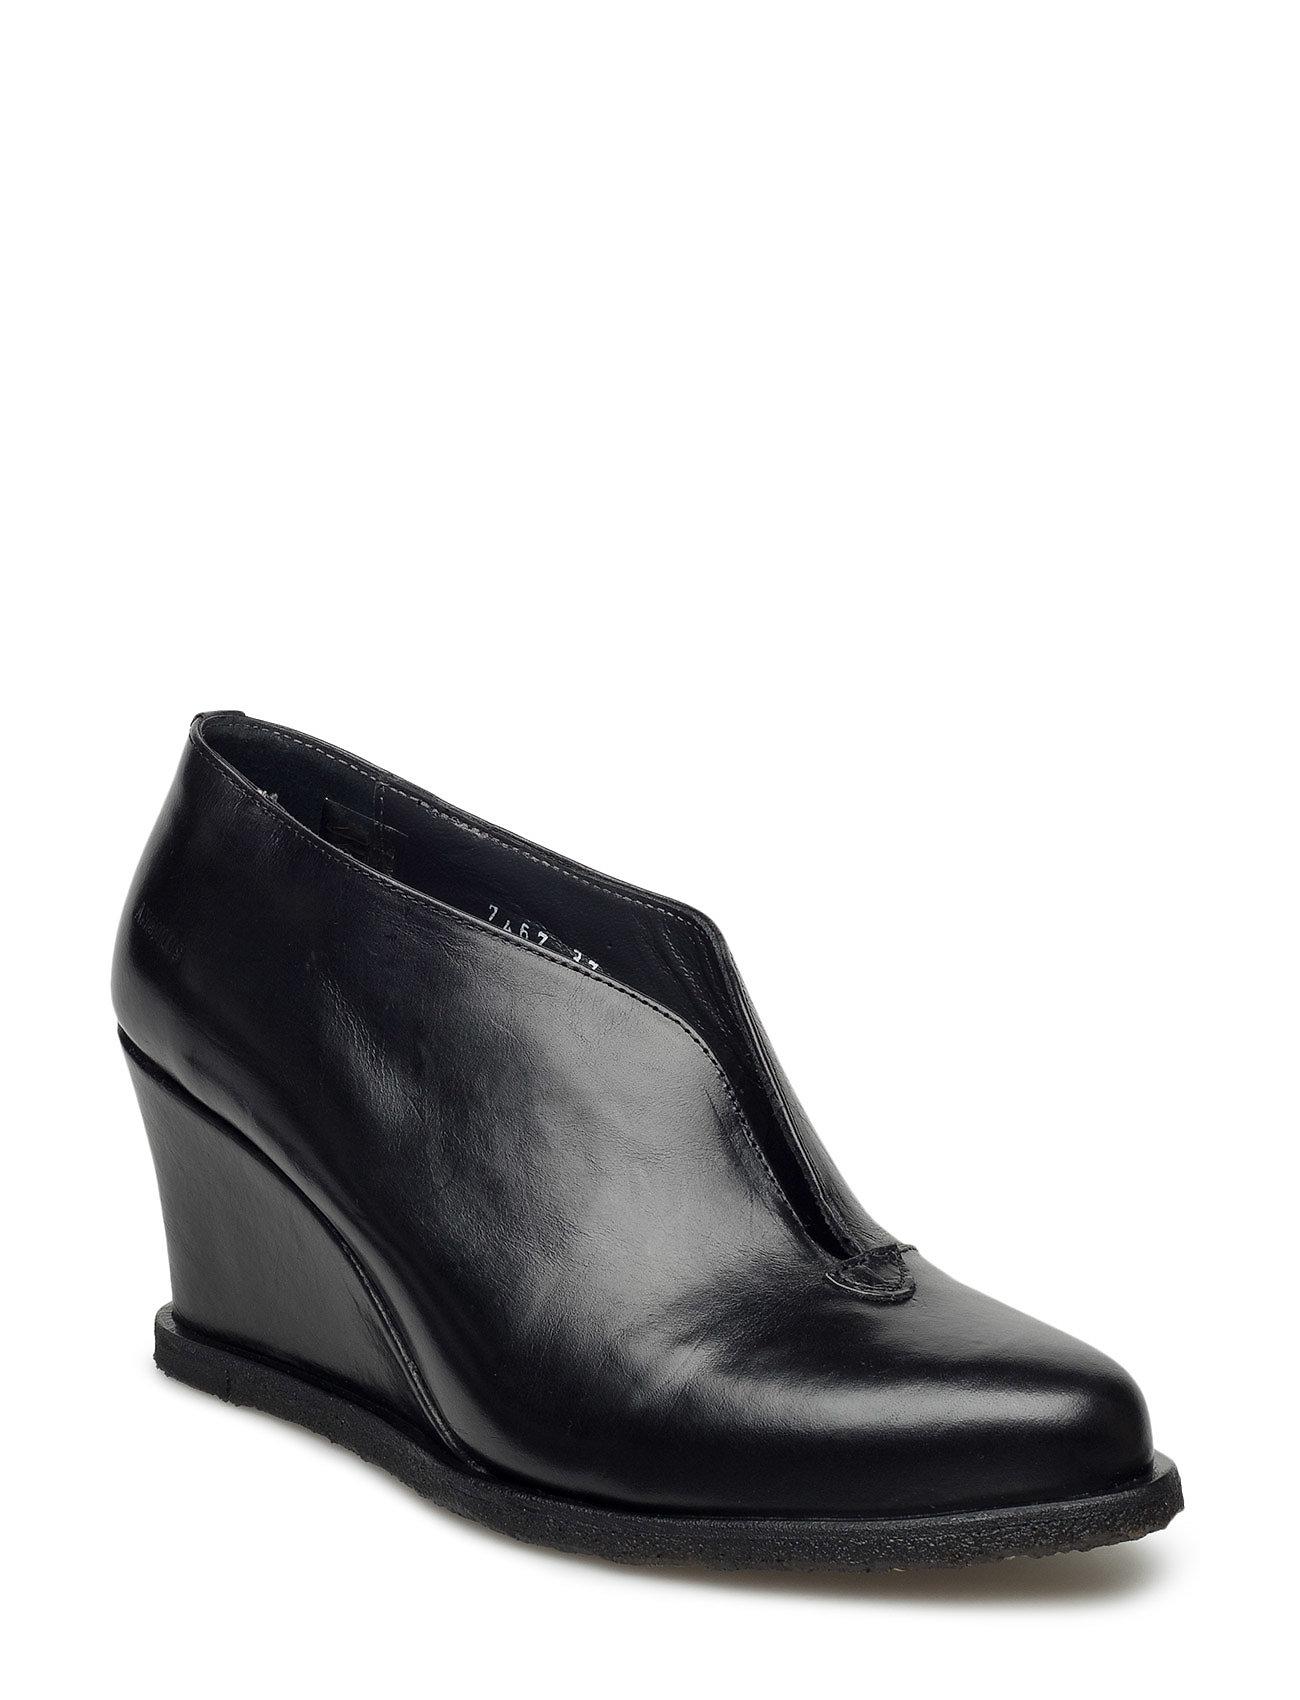 Wedge Boot ANGULUS Støvler til Kvinder i